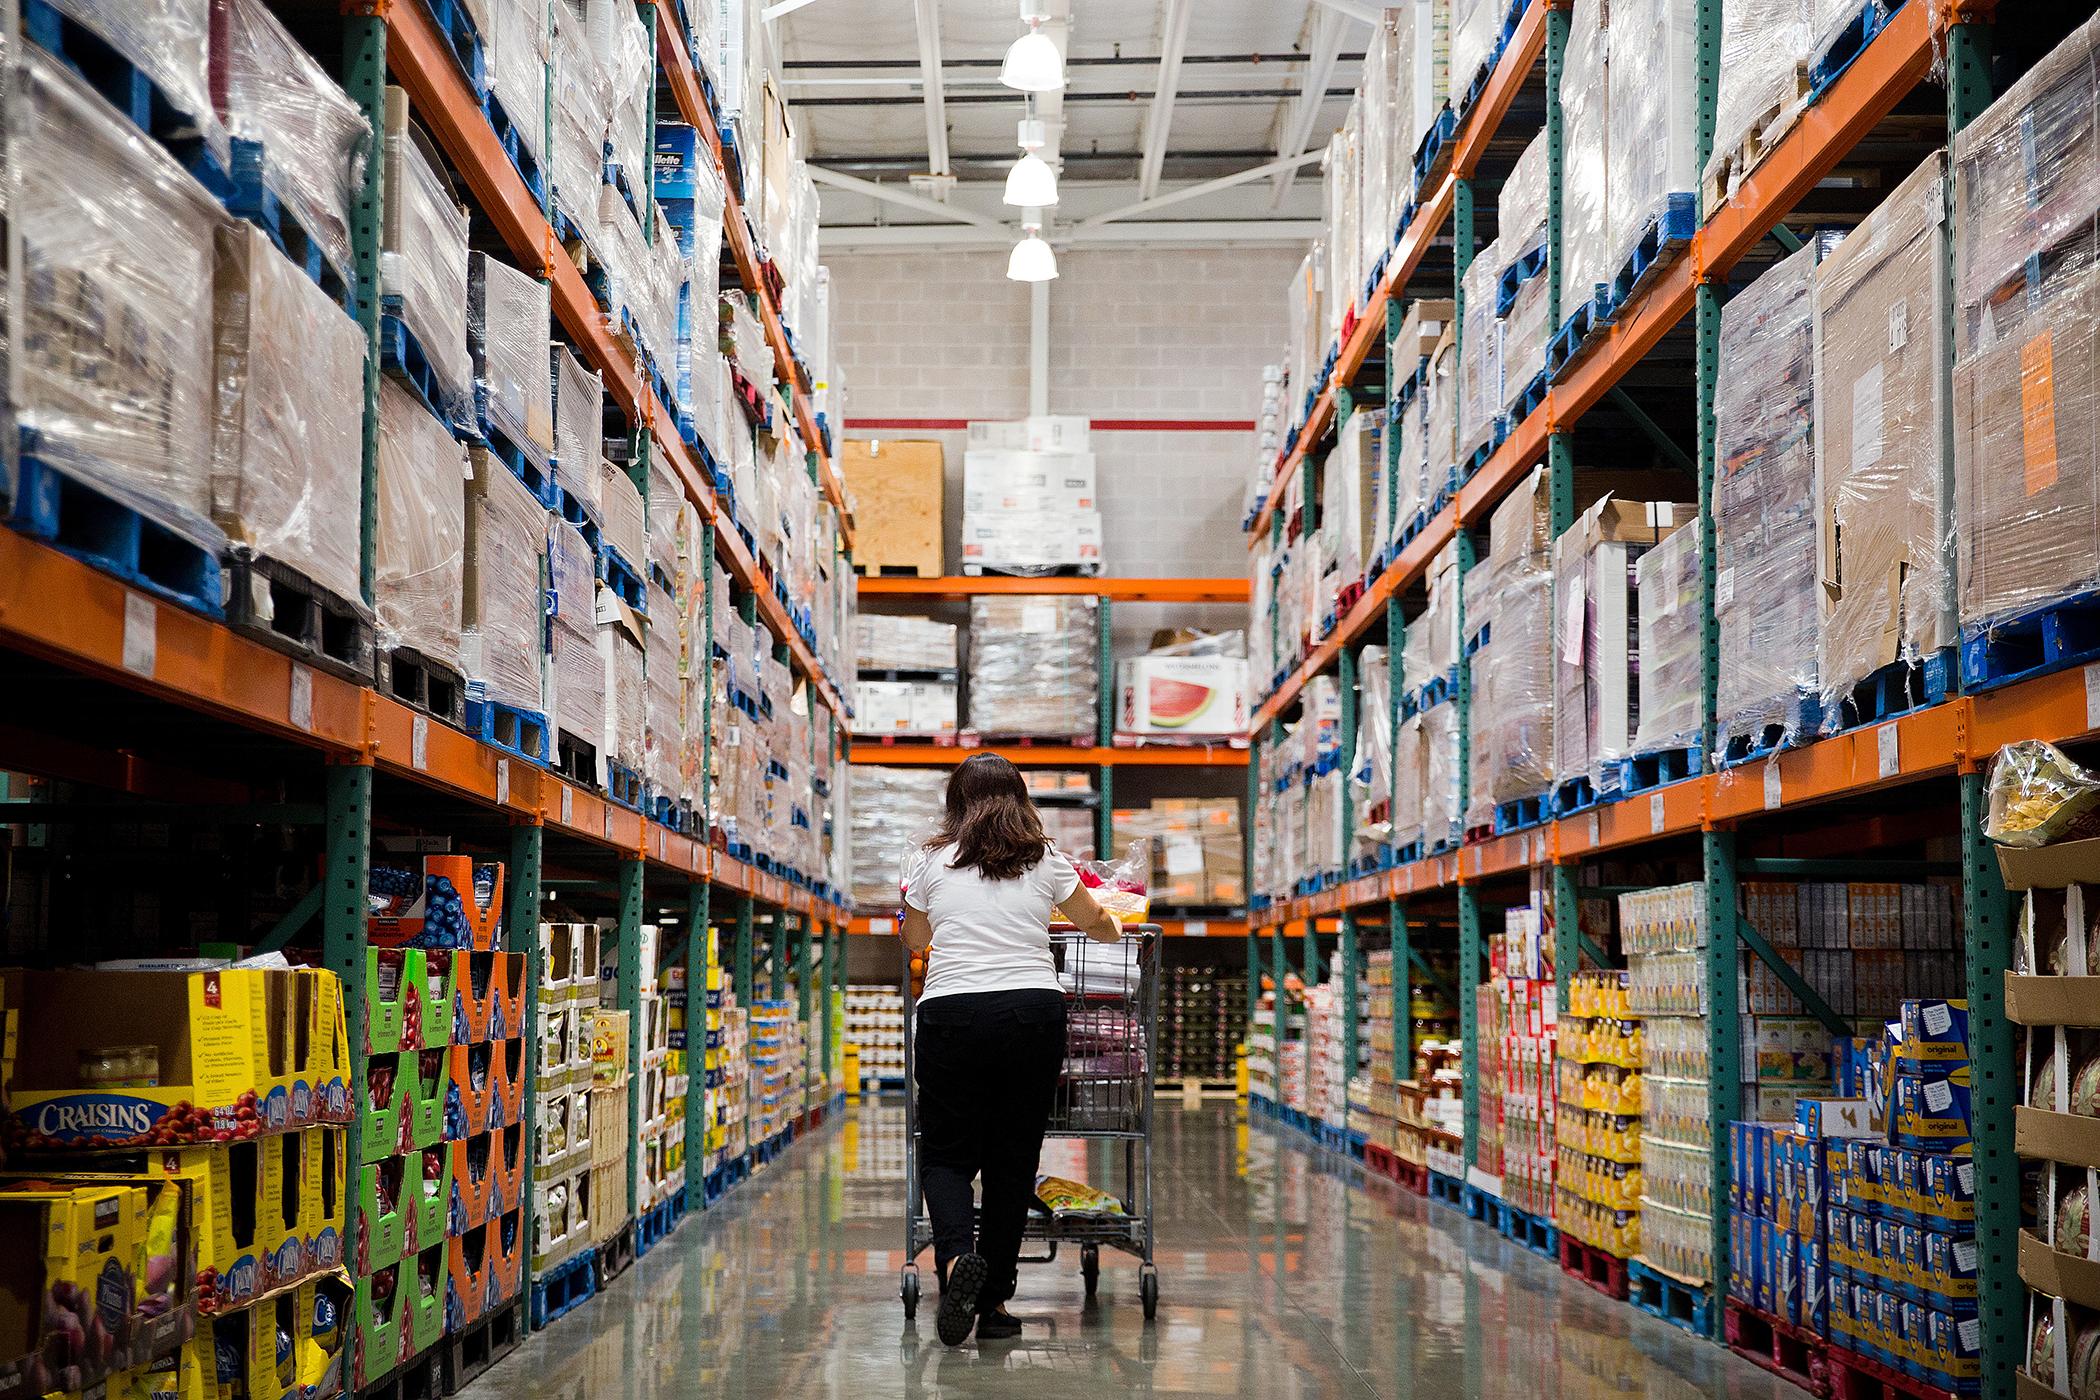 170616-grocery-stocks-amazon-whole-foods-costco